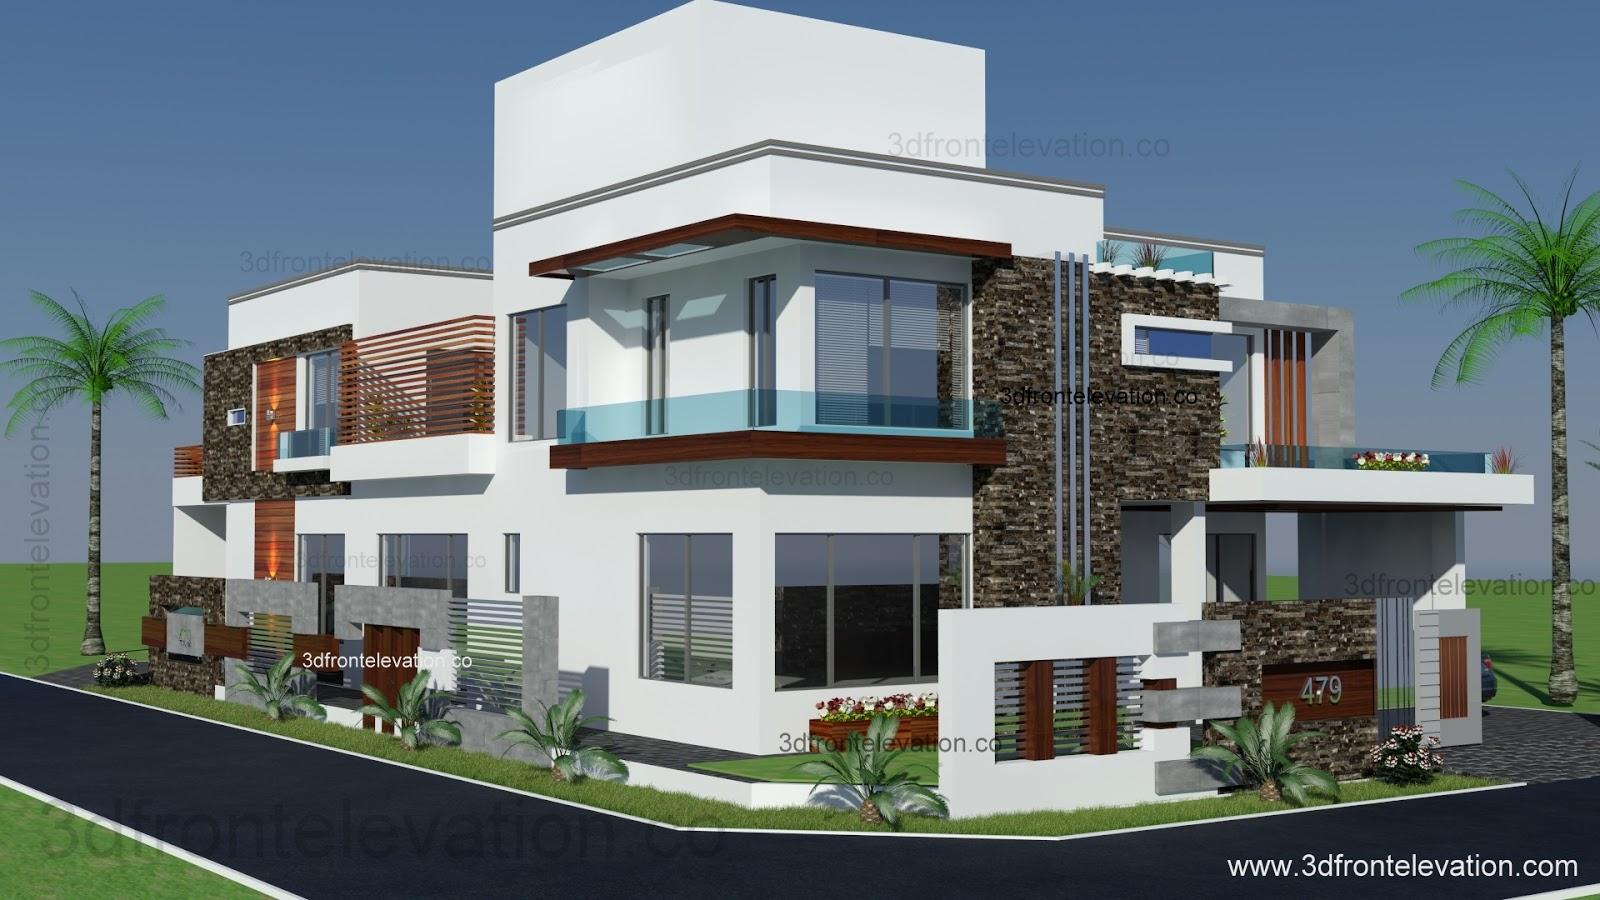 3d Front Elevation Corner House : D front elevation square yards house plan